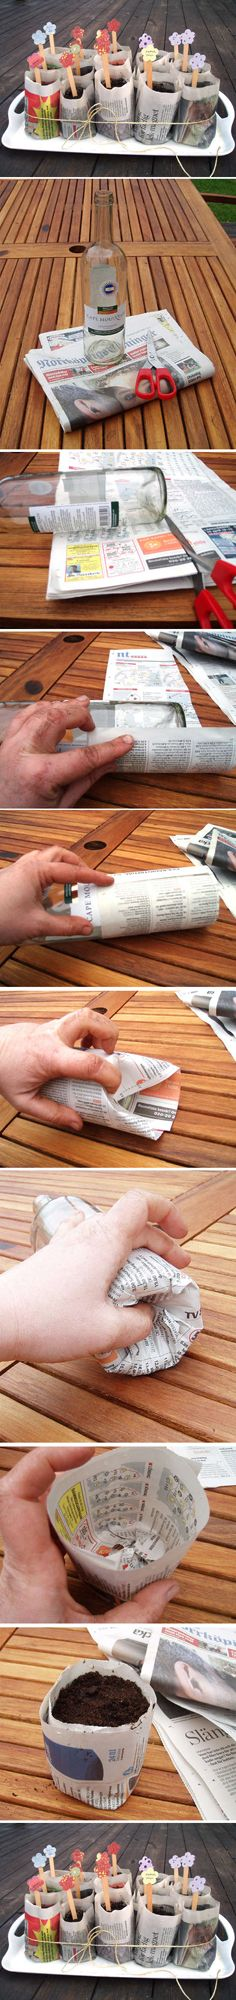 DIY newspaper seedling pots #homesfornature